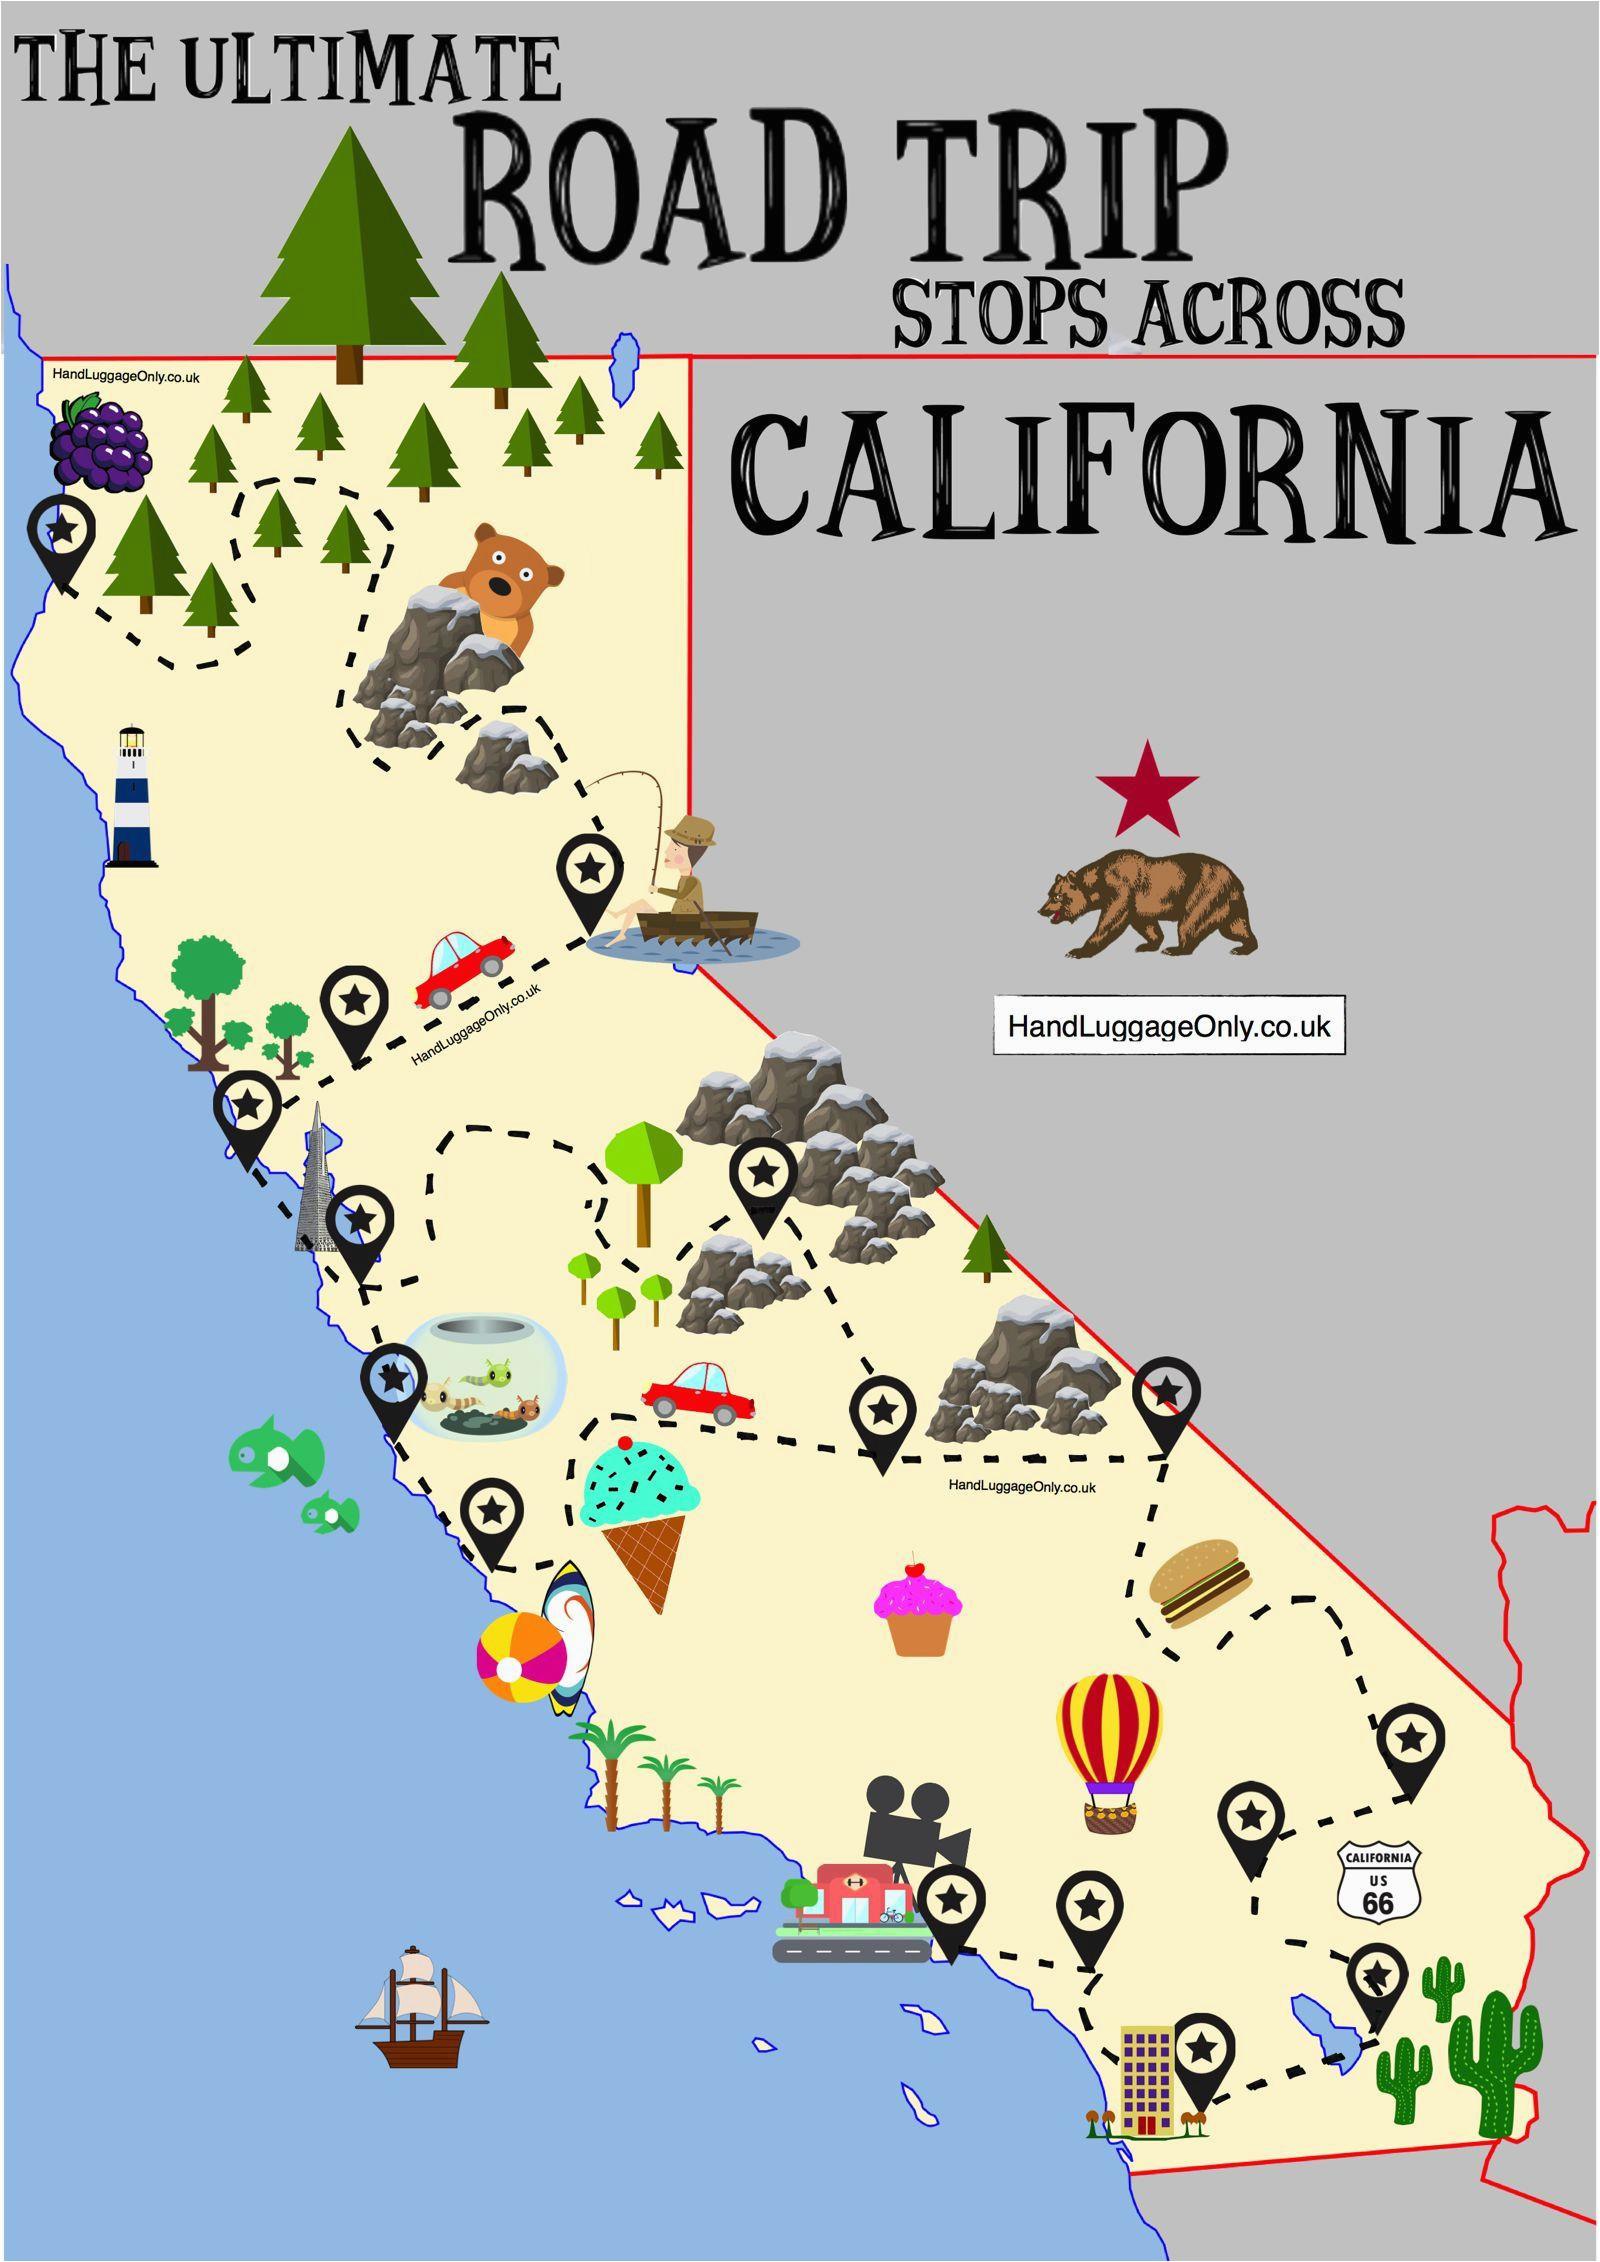 California Coast Camping Map the Ultimate Road Trip Map Of ... on california snorkeling map, california shooting map, california marine protected area map, california dunes map, california theater map, california red bluff ca map, california covered bridges map, california tide pools map, california recreation map, california camping book, california rates, northern california map, california ski areas map, california nature map, big sur map, norcal map, california reservations, california map redding ca, california tent camping locations, california wildlife map,